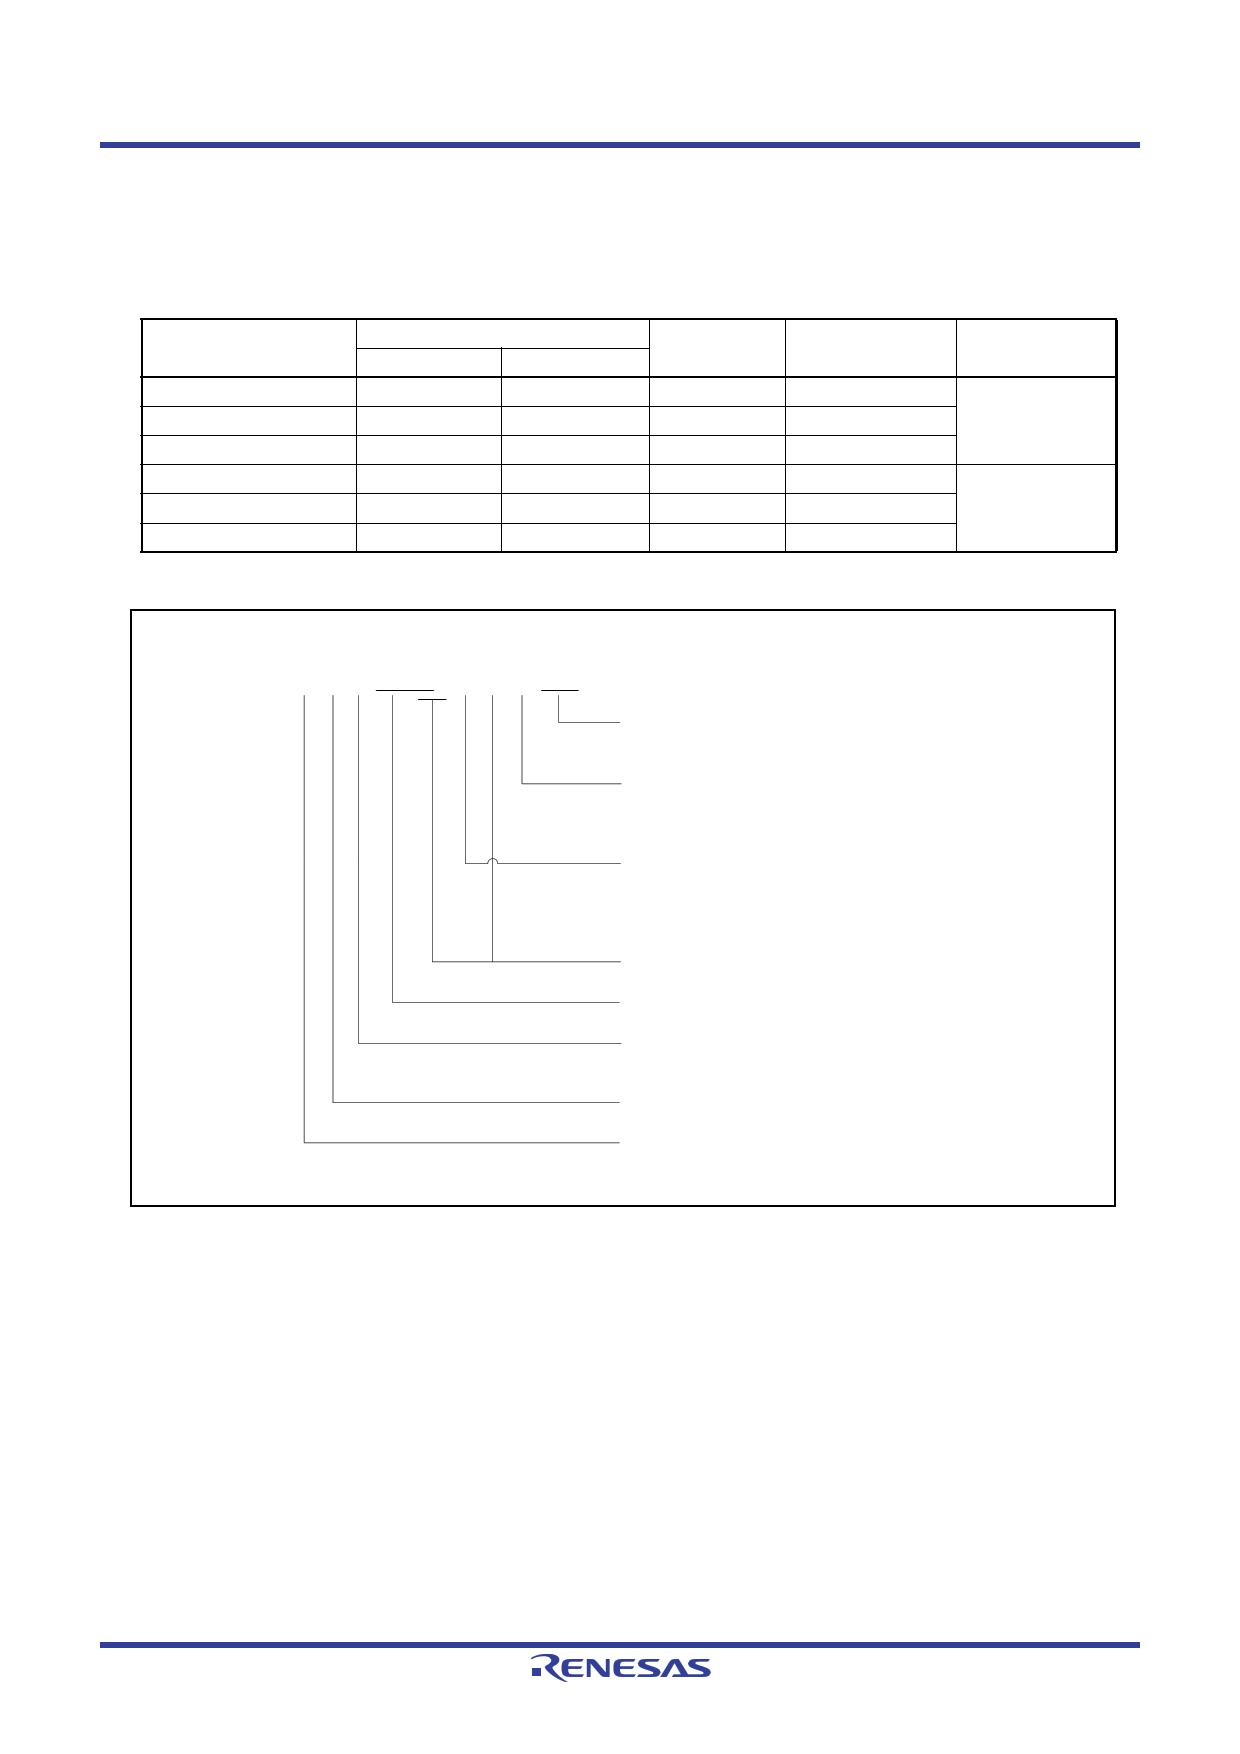 R5F21344CDFP pdf, 반도체, 판매, 대치품